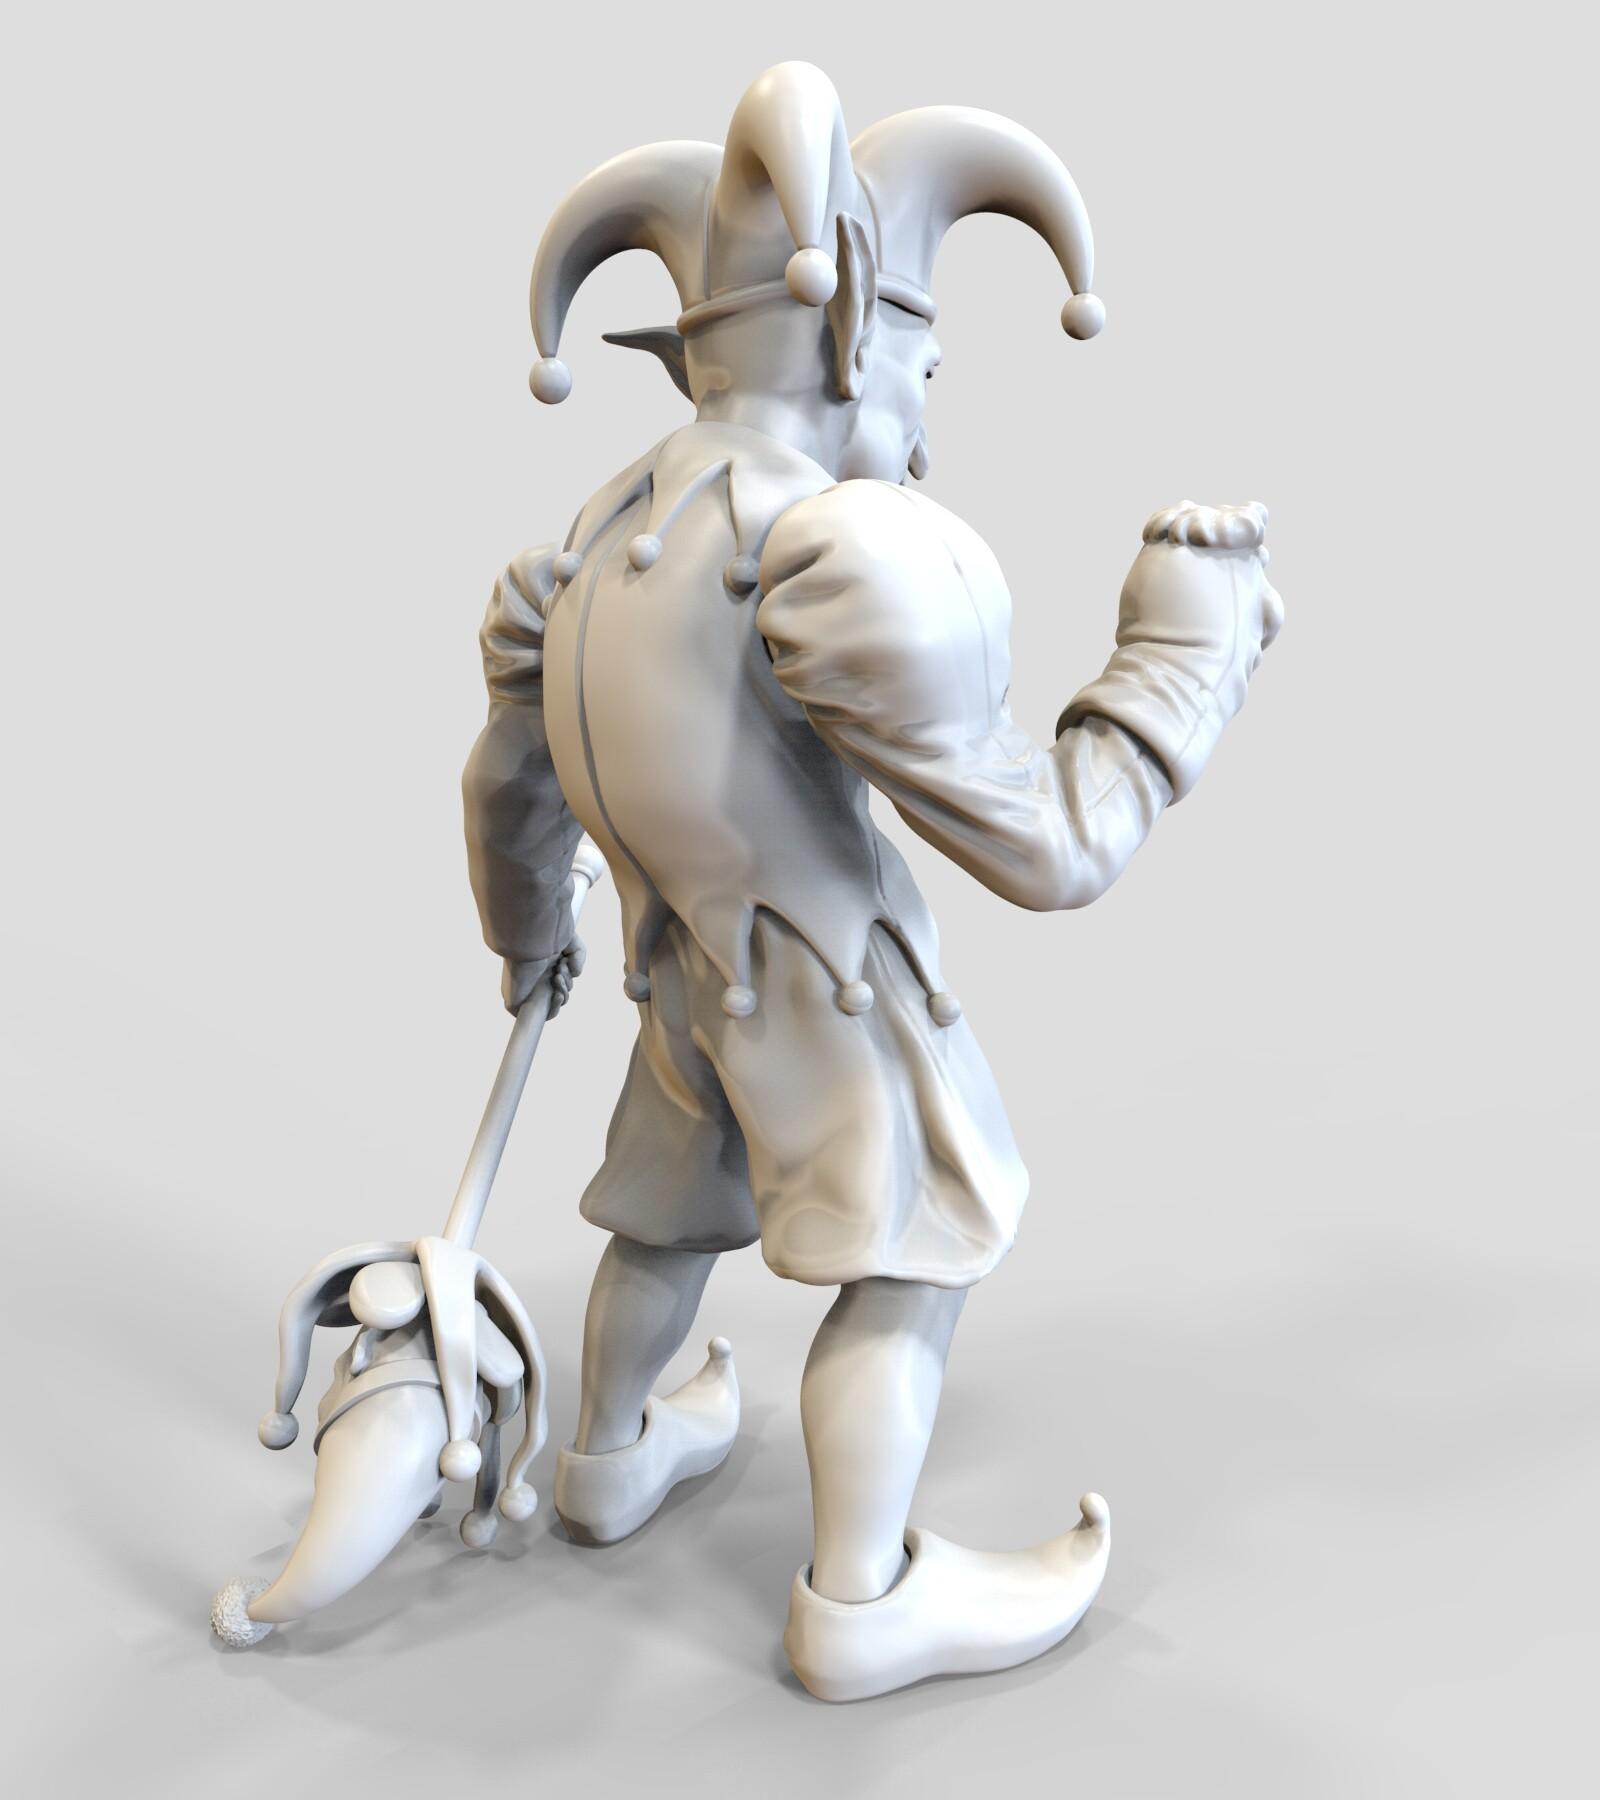 Andre de souza goblin jester 7